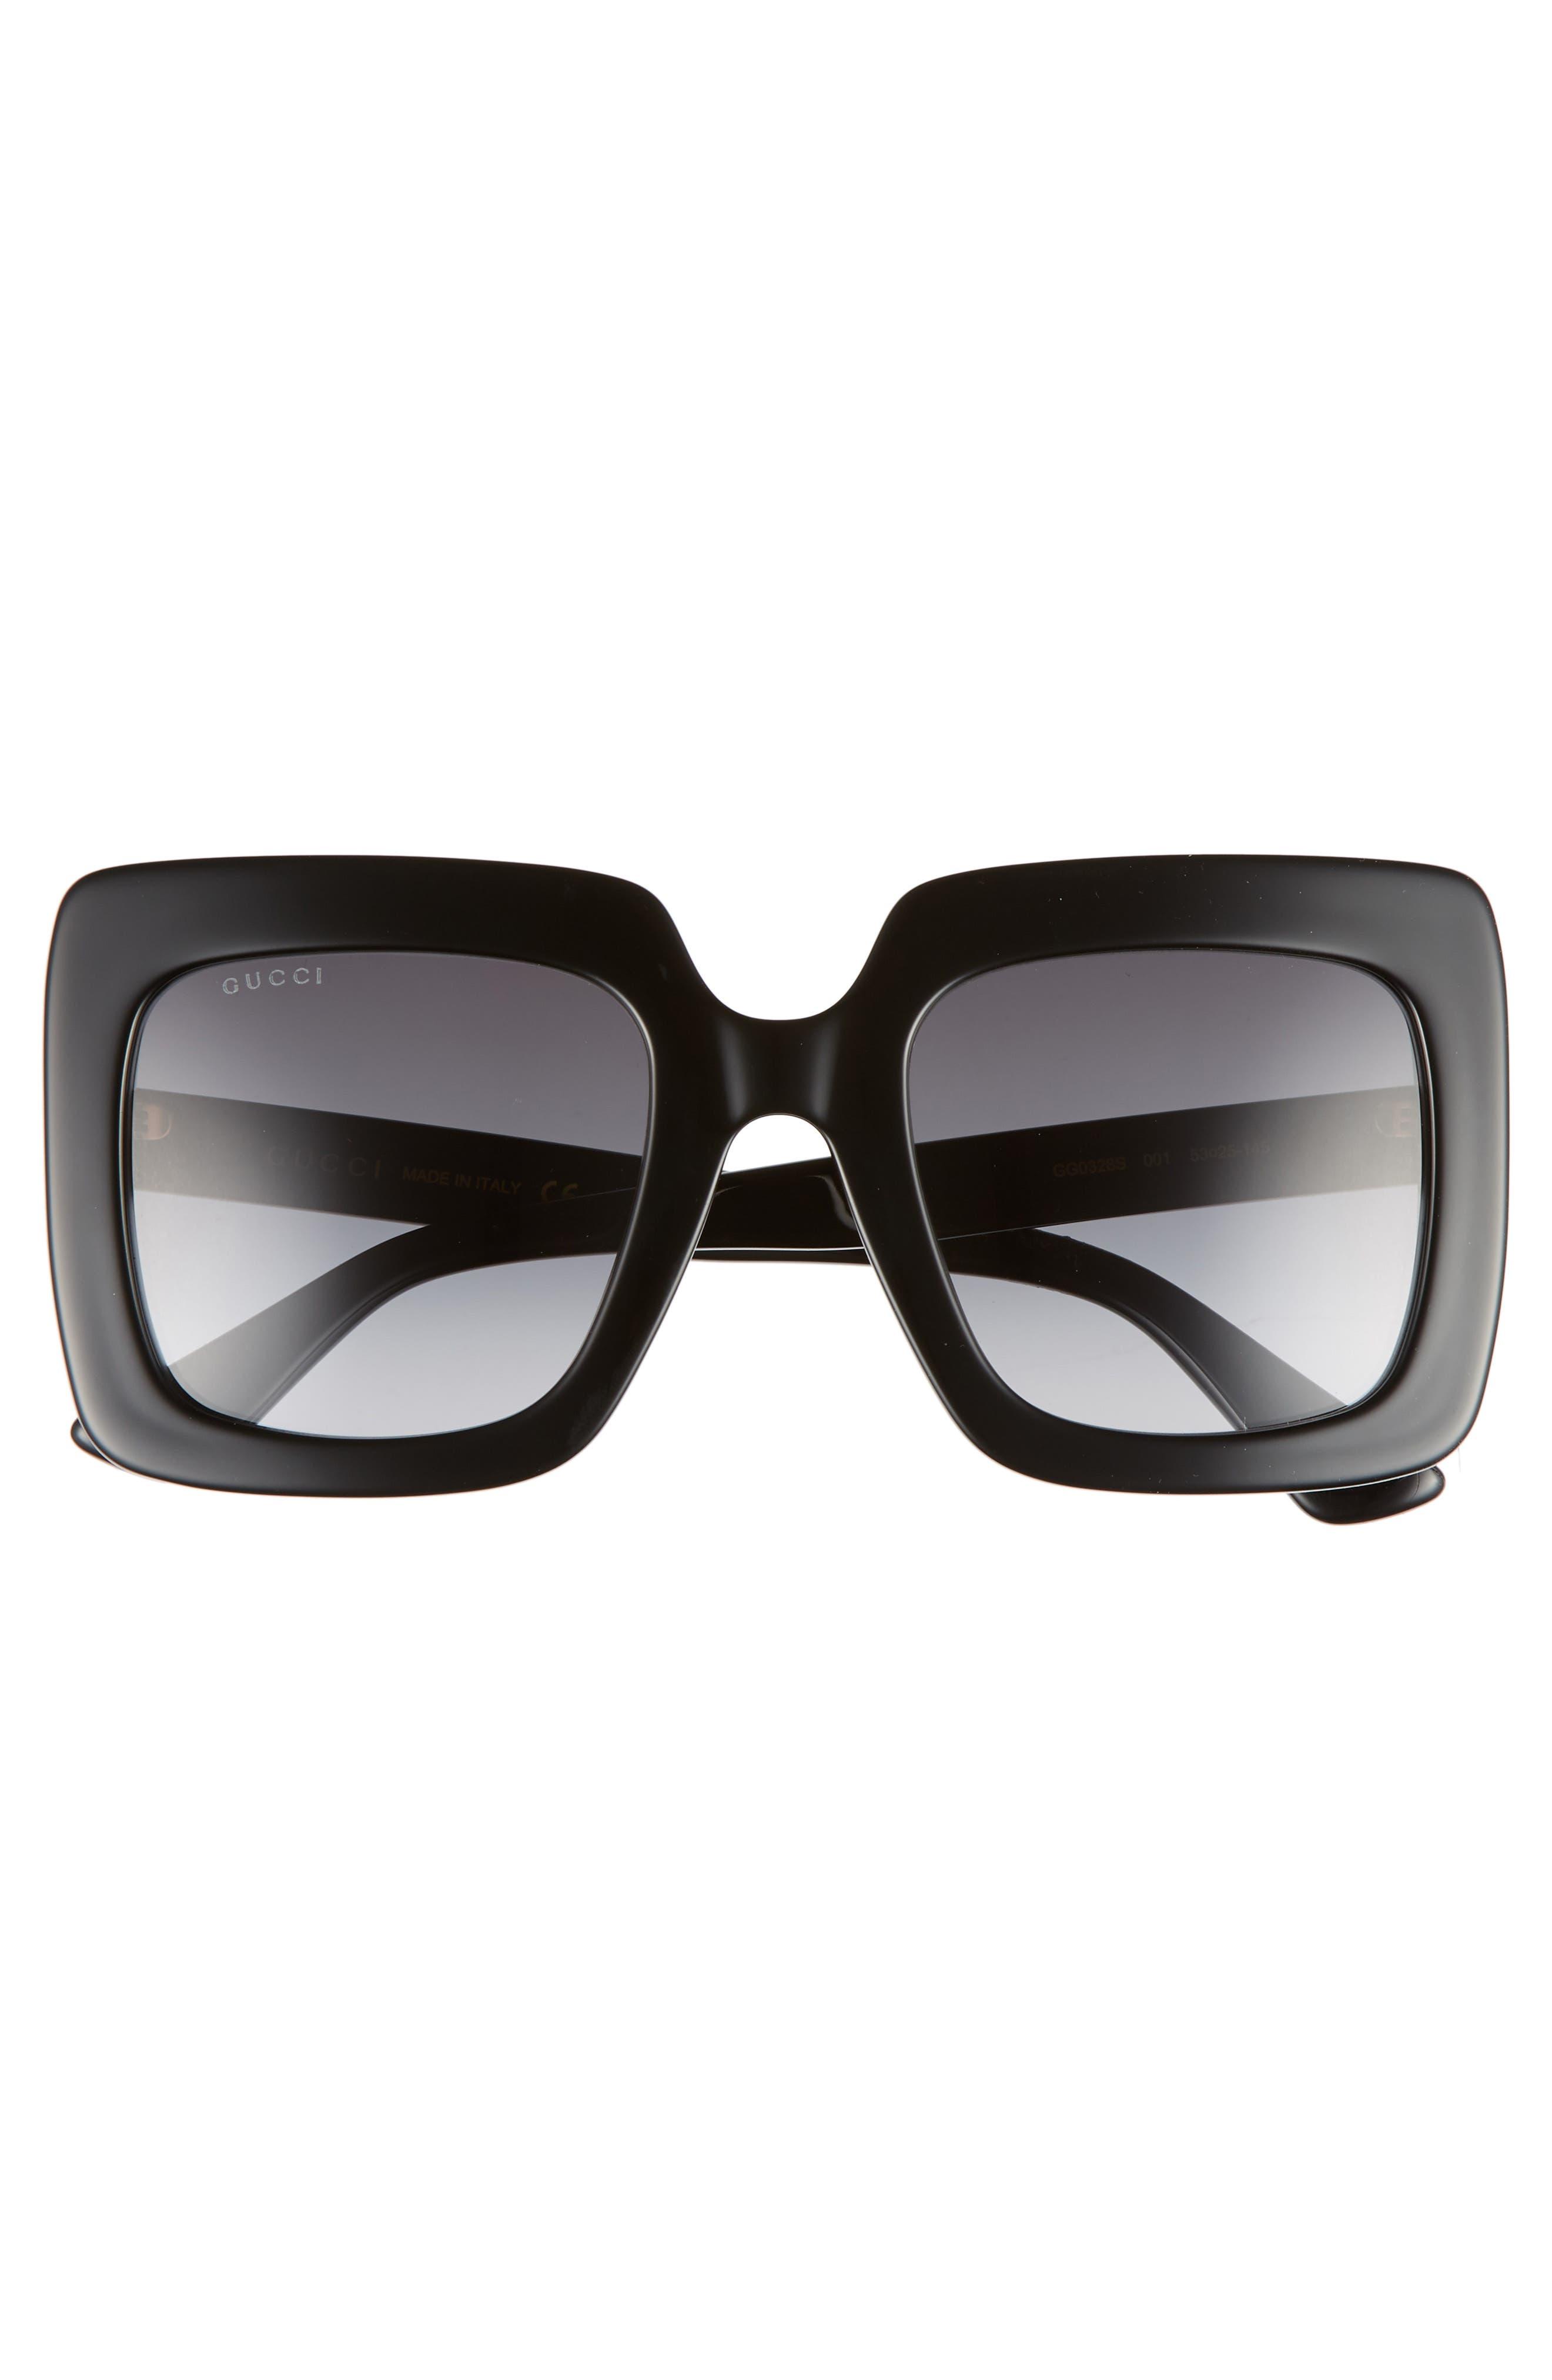 GUCCI, 53mm Square Sunglasses, Alternate thumbnail 3, color, BLACK